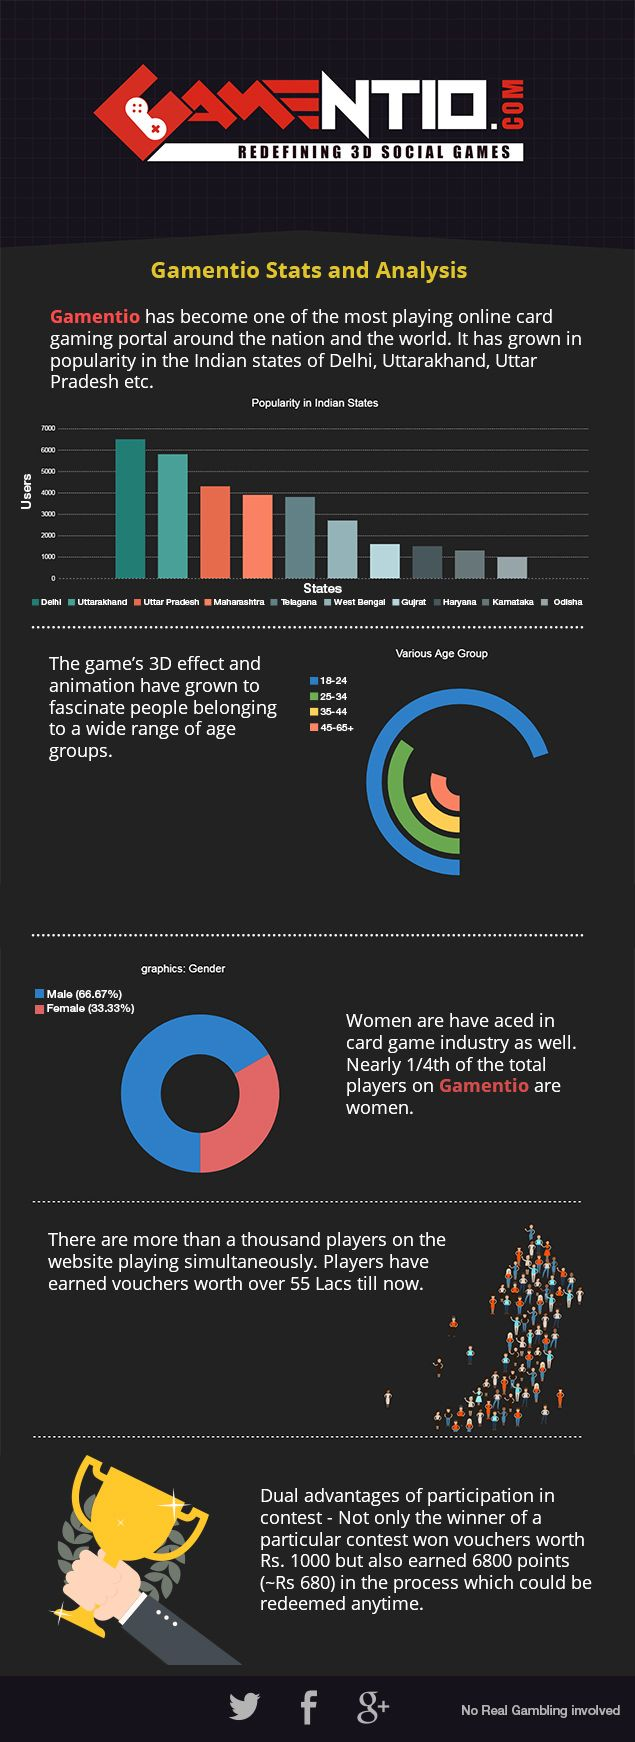 Gamentio Stats and Analysis - Blog | Rummy, Teen patti, Poker, Blackjack - gamentio